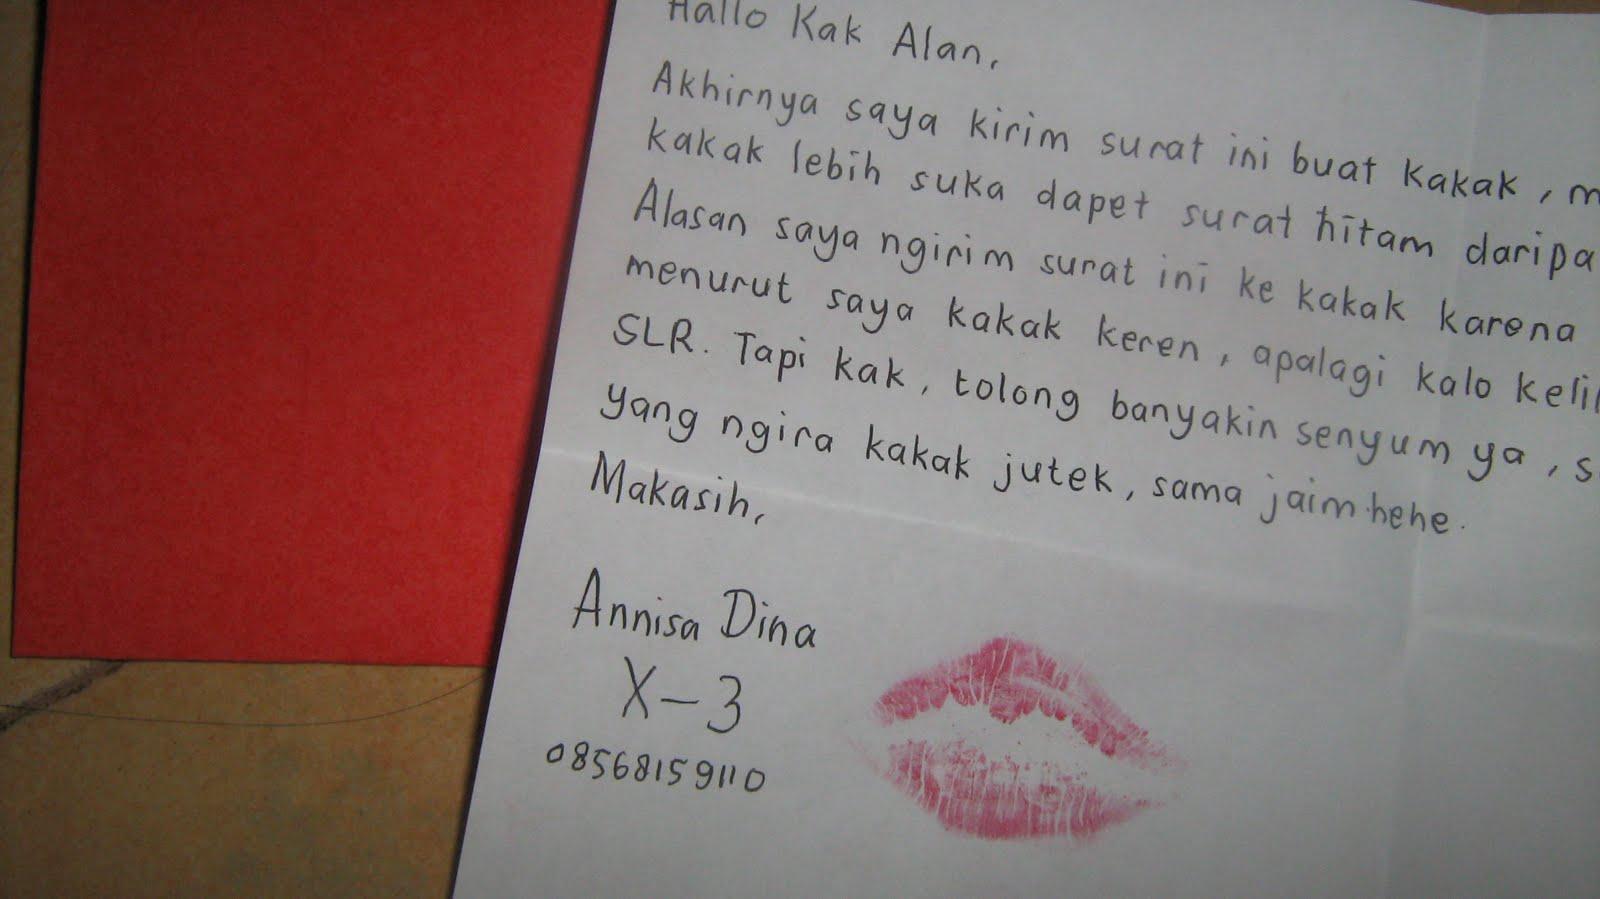 Yuk Hilangkan Budaya Surat Cinta Untuk Kakak Kelas Saat Mos Youth